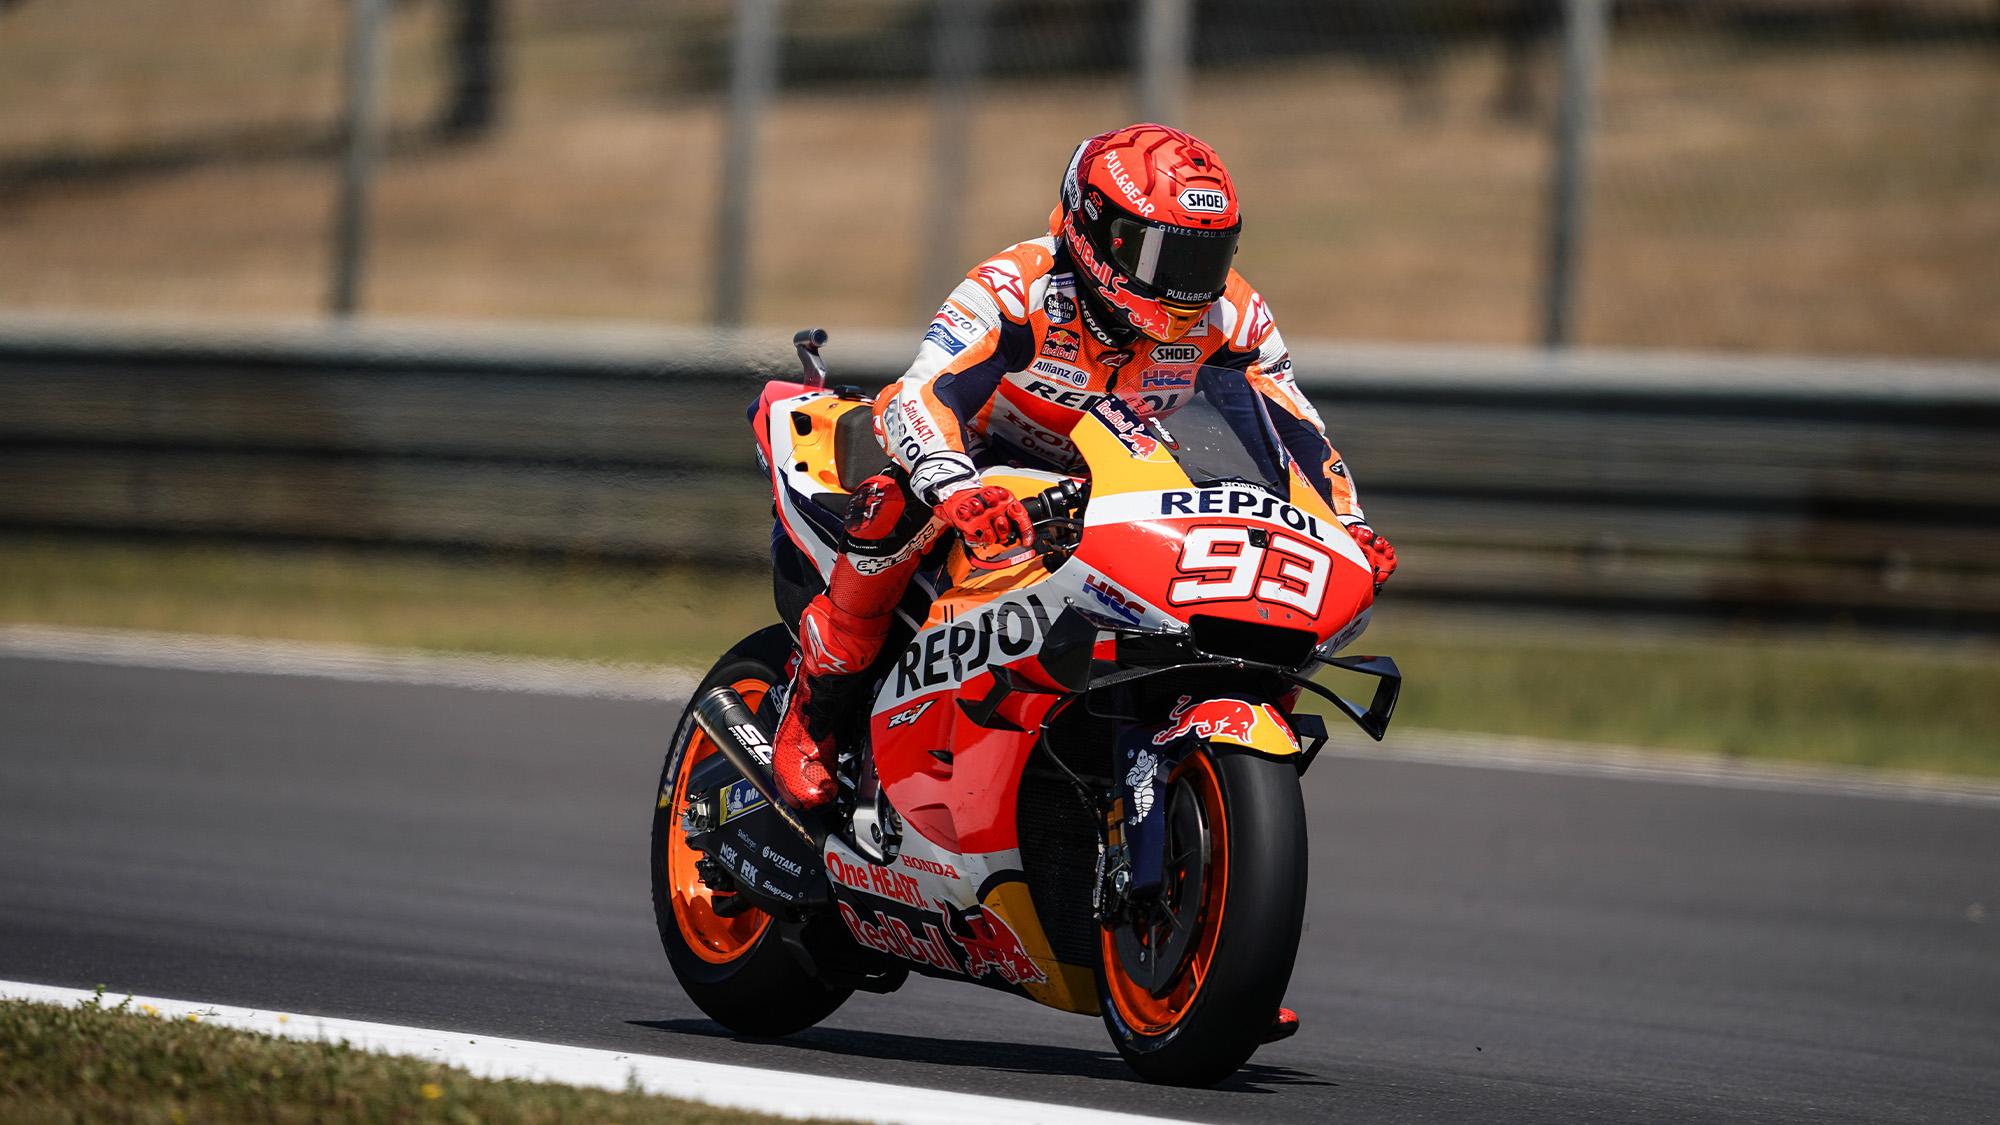 Marc Marquez returns at the 2021 MotoGP Portuguese GP